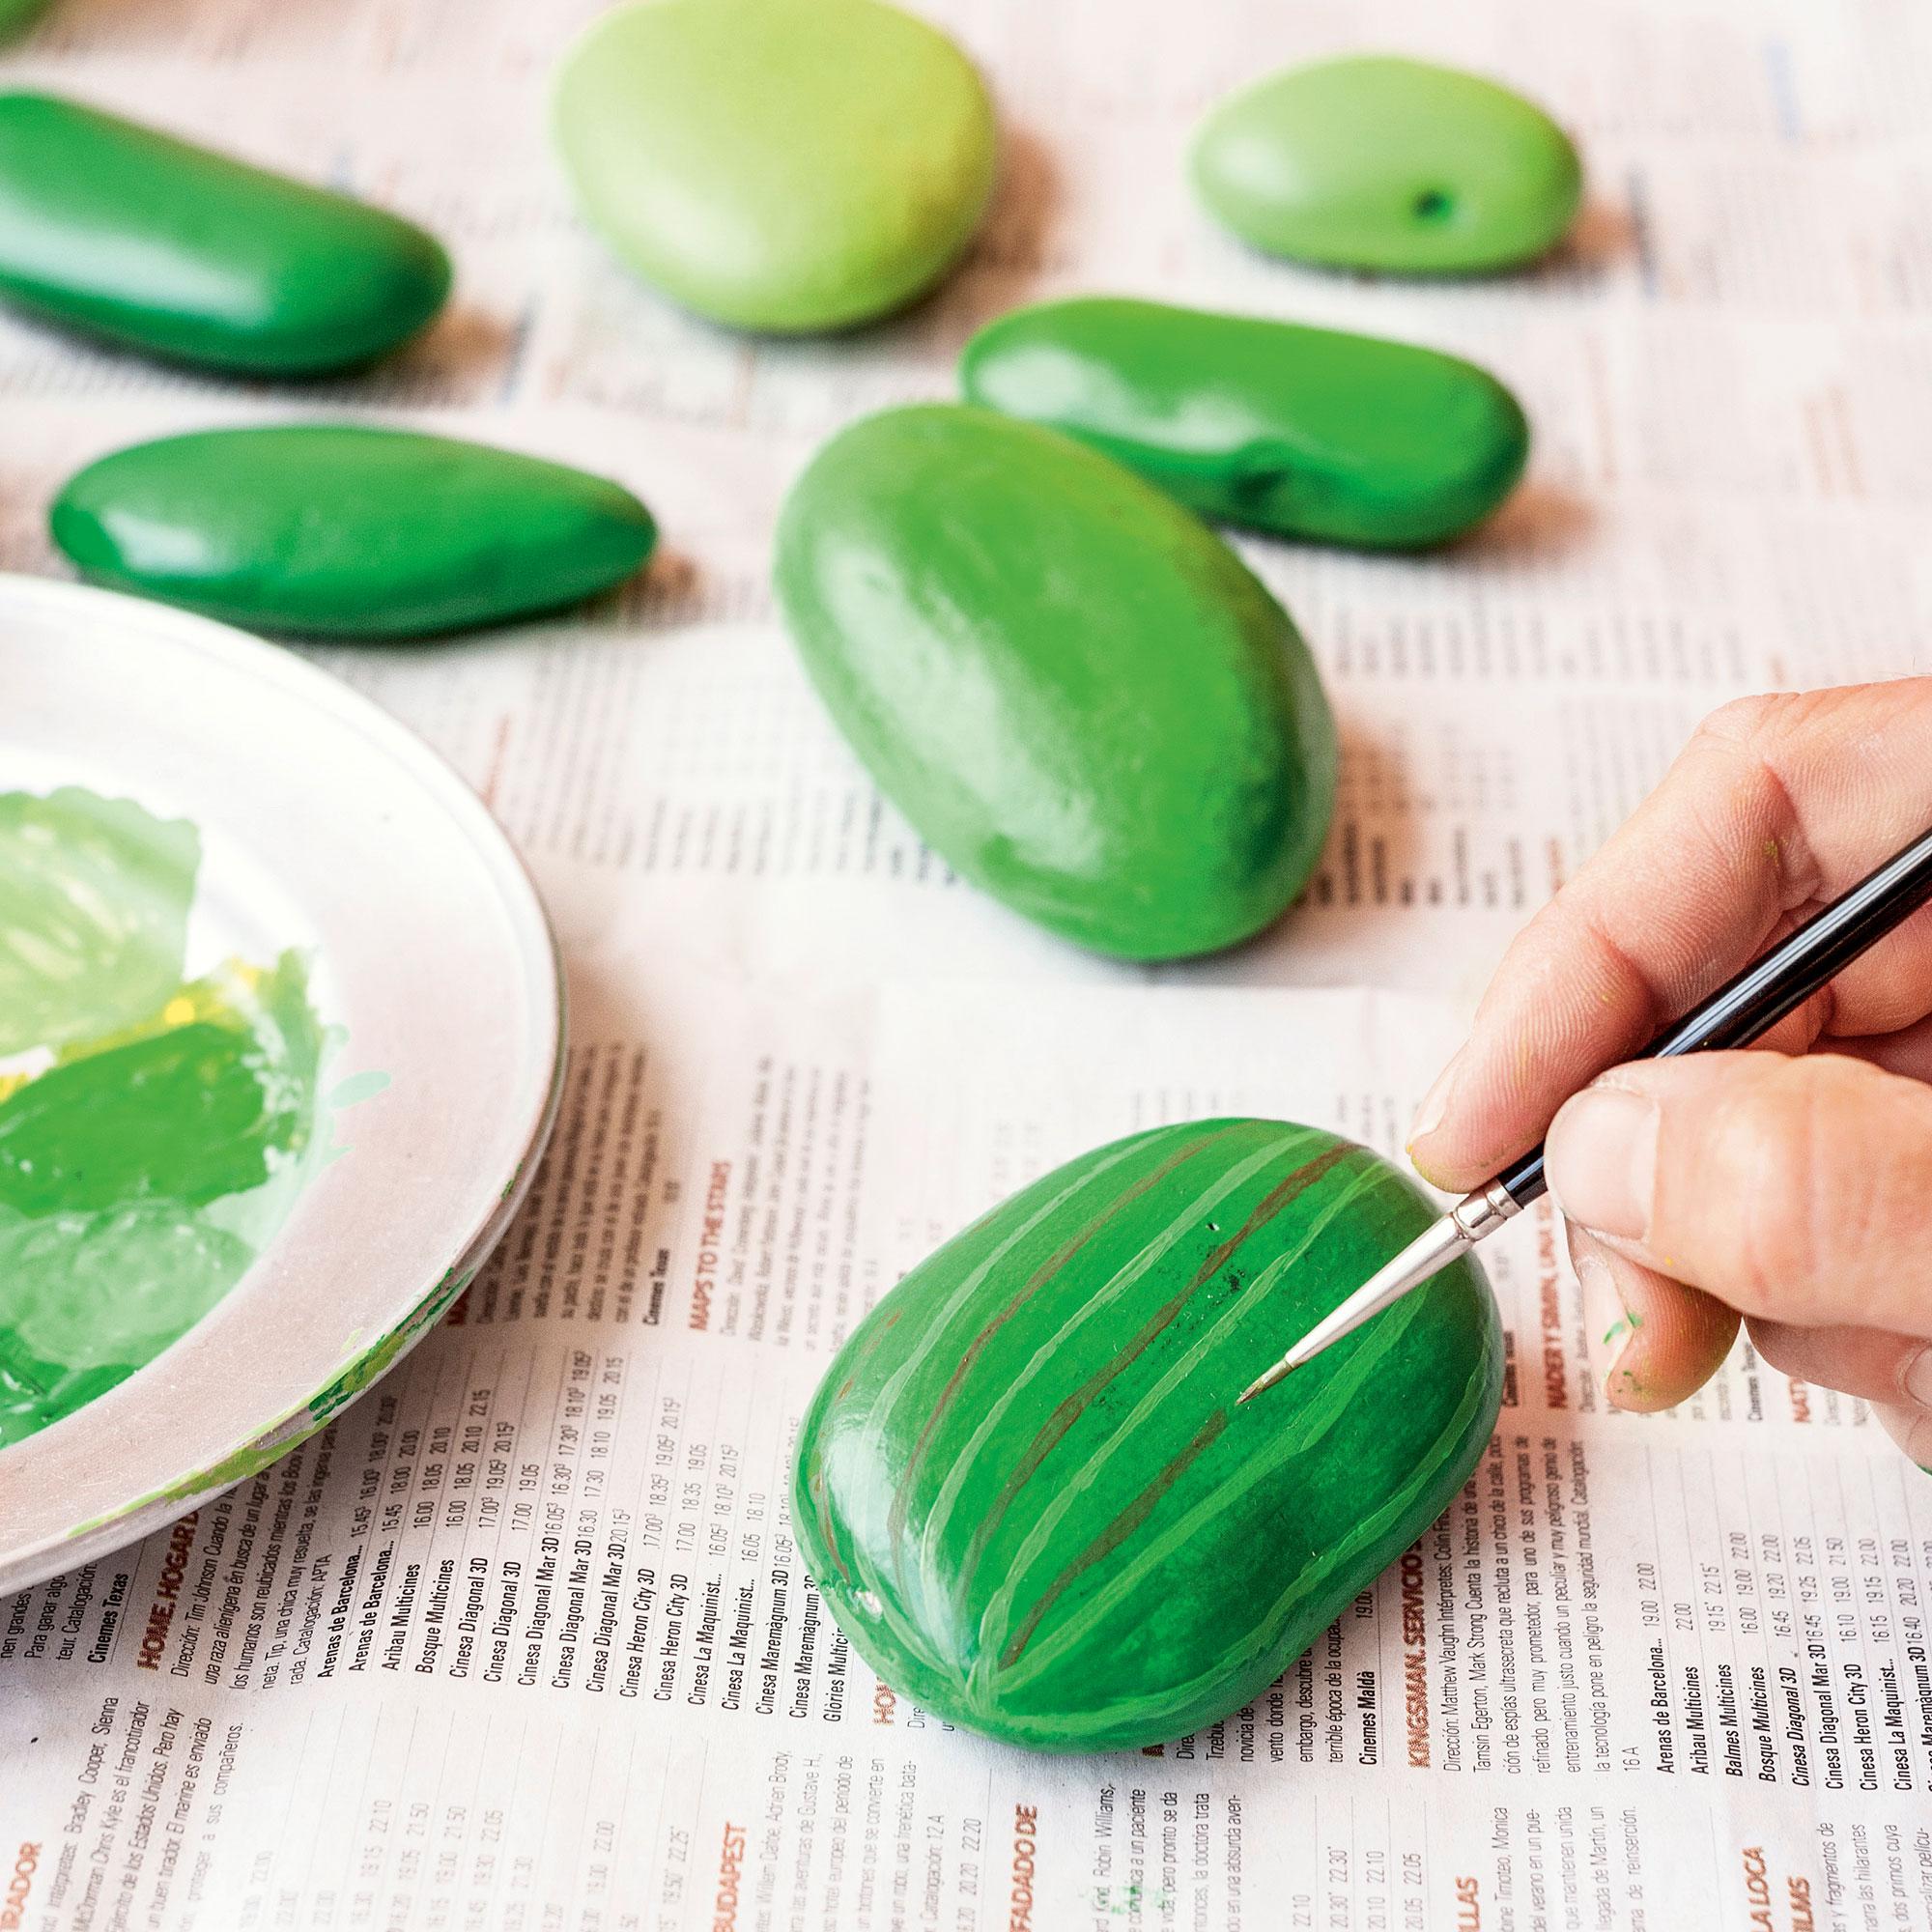 Dibujos Para Pintar Piedras Affordable Colorear Mosaico De Mrmol Y - Dibujos-para-pintar-piedras